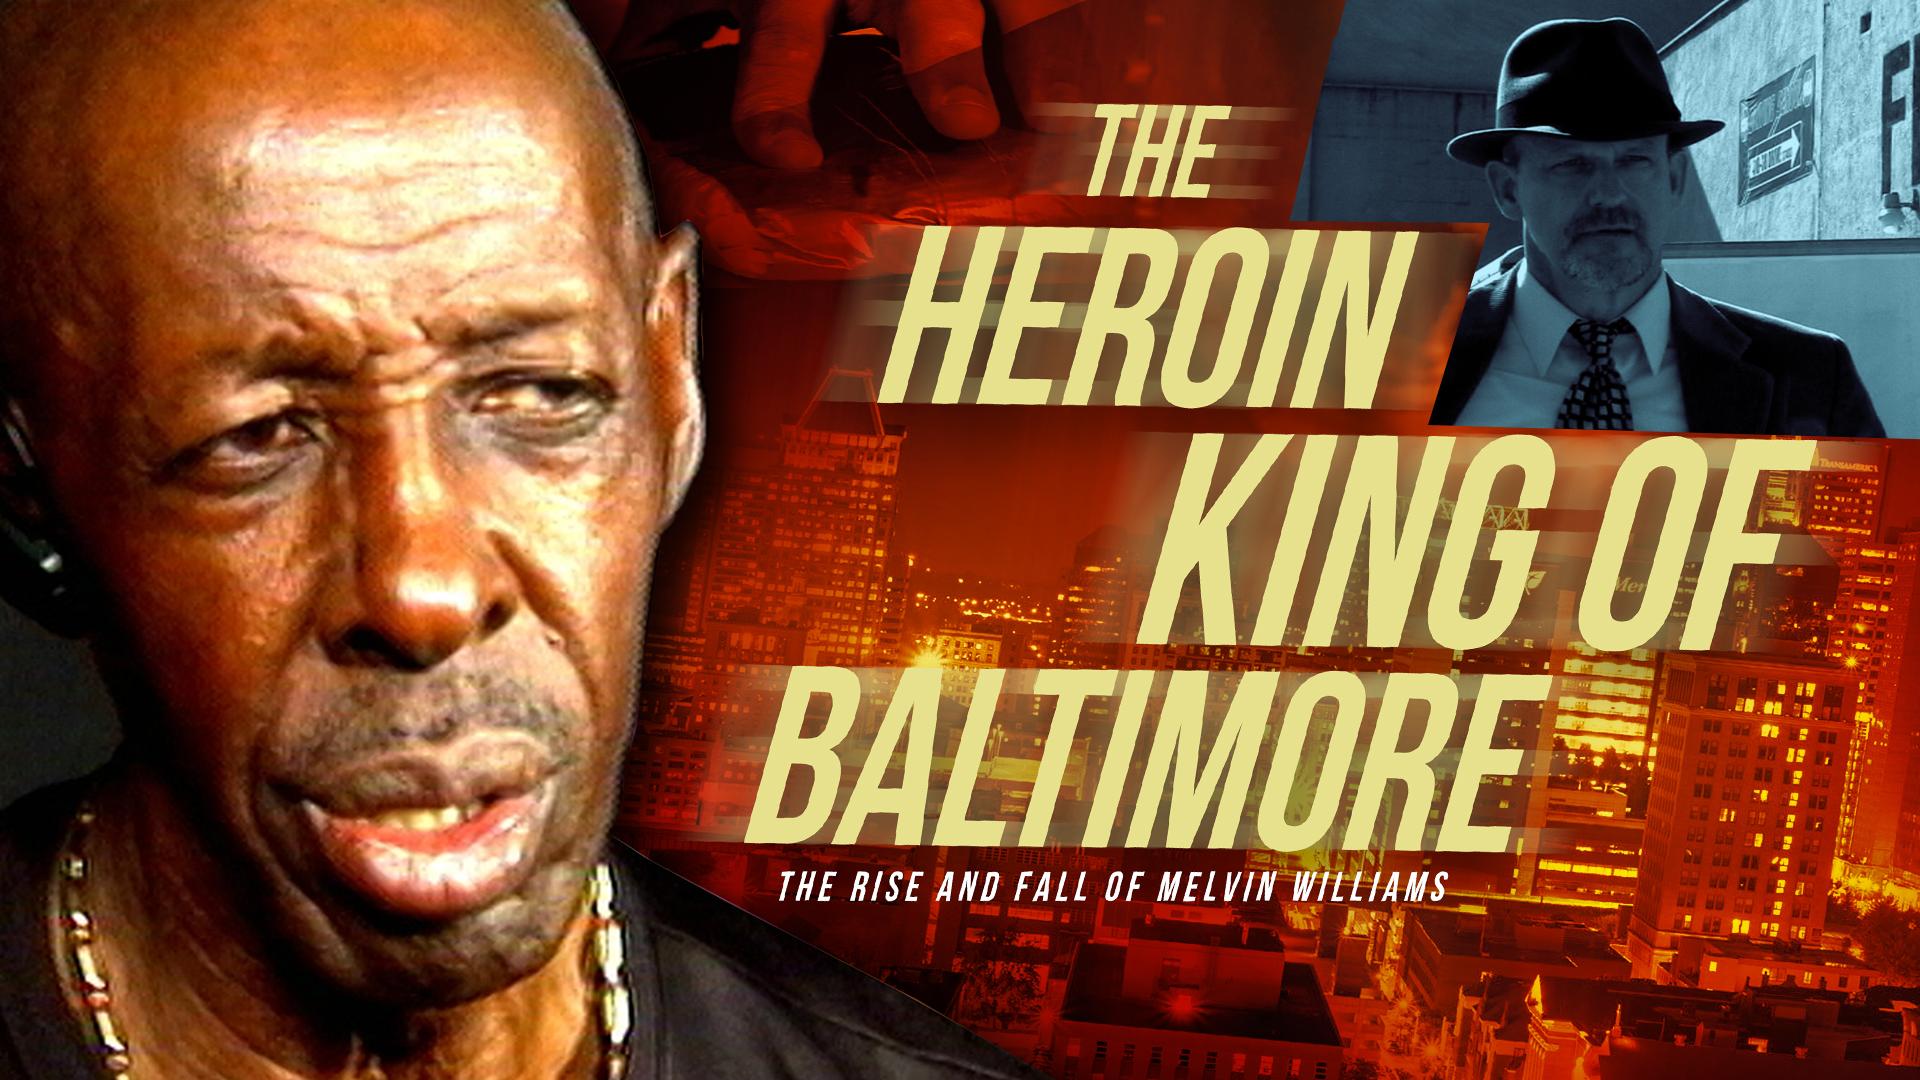 The Heroin King of Baltimore